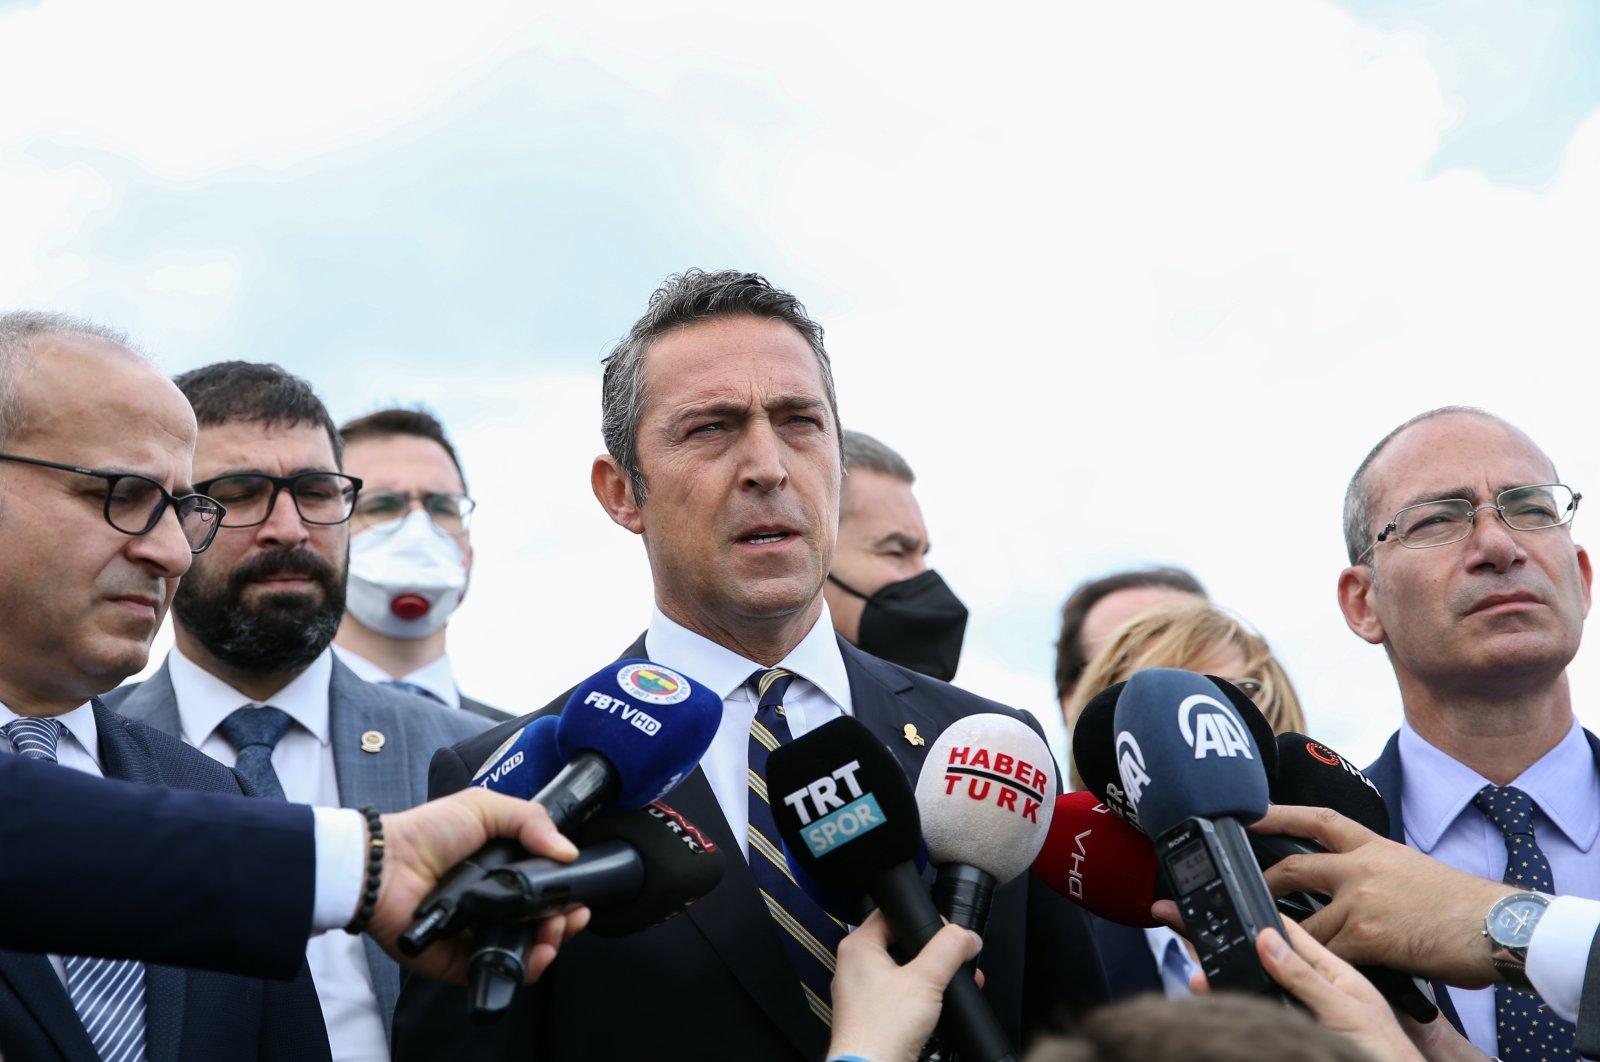 Fenerbahçe chairperson Ali Koç speaks to reporters after the hearing, in Istanbul, Turkey, June 4, 2021. (AA PHOTO)